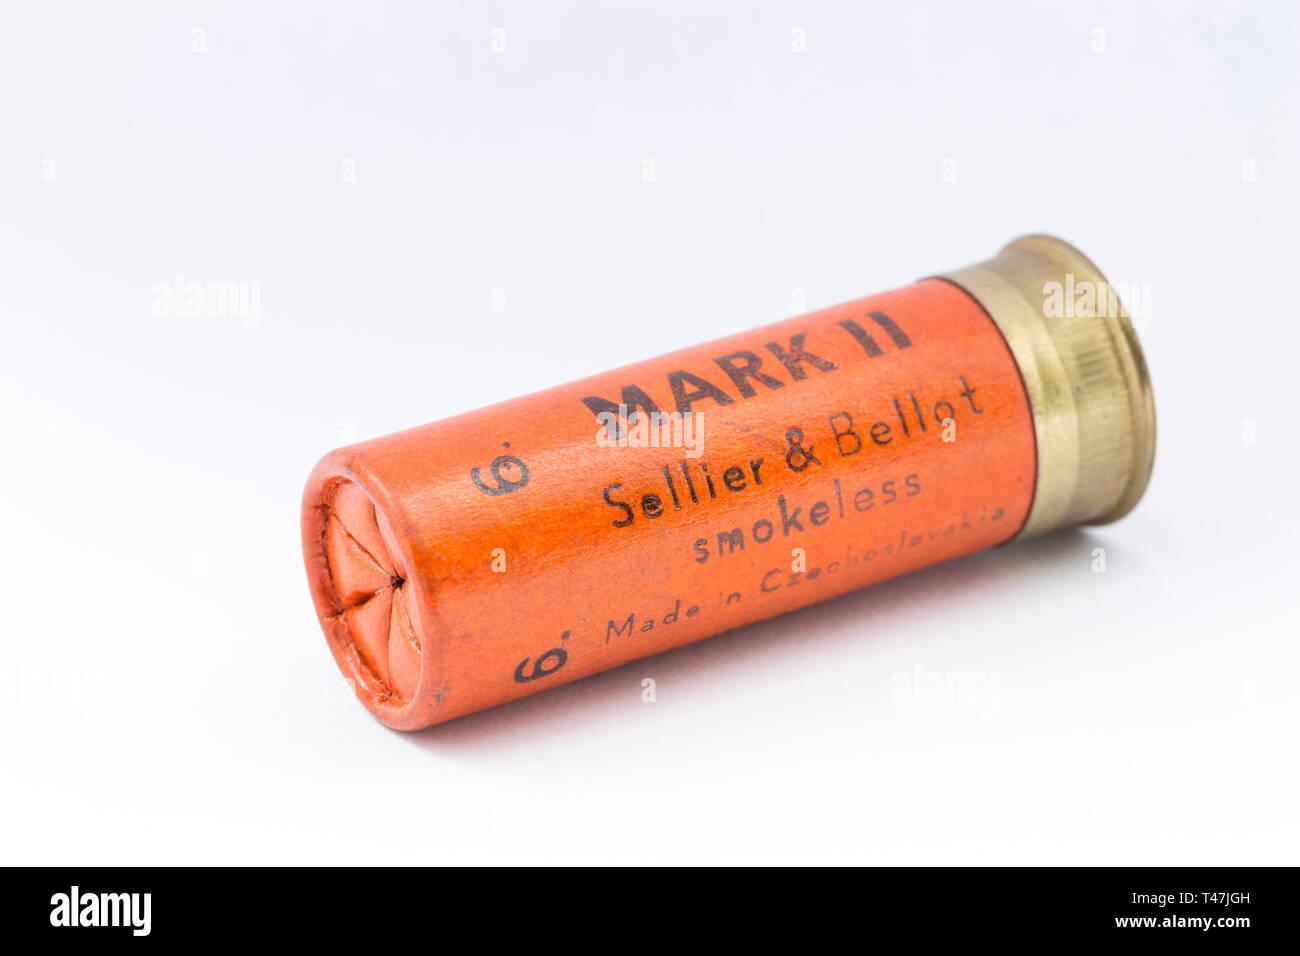 An old paper case Sellier & Bellot 12 gauge shotgun carridge loaded